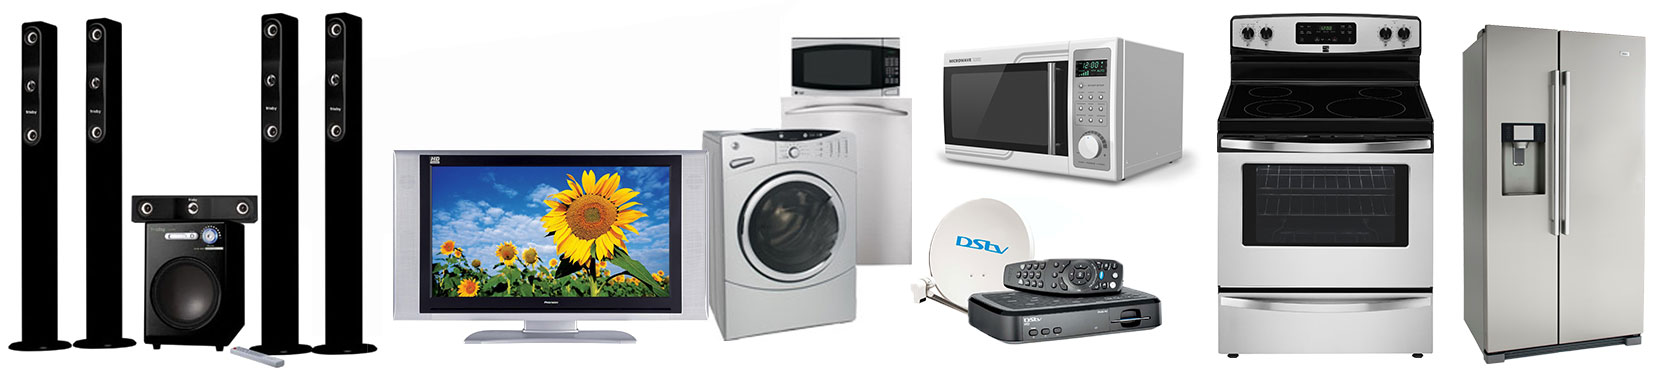 Appliance Care